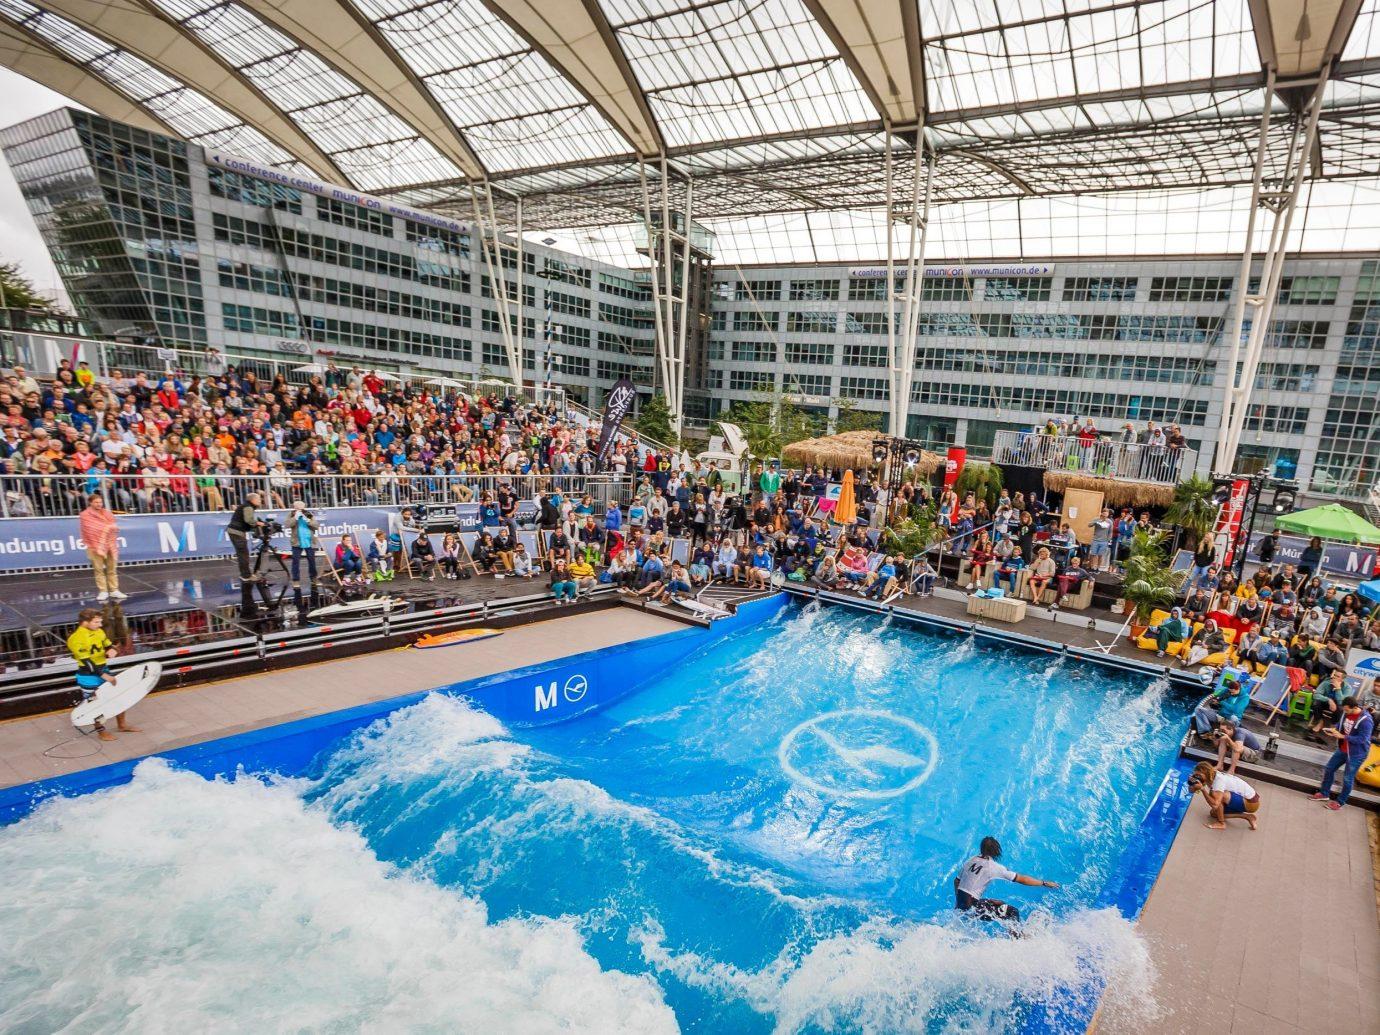 Offbeat leisure swimming pool sports sport venue endurance sports swimming Water park